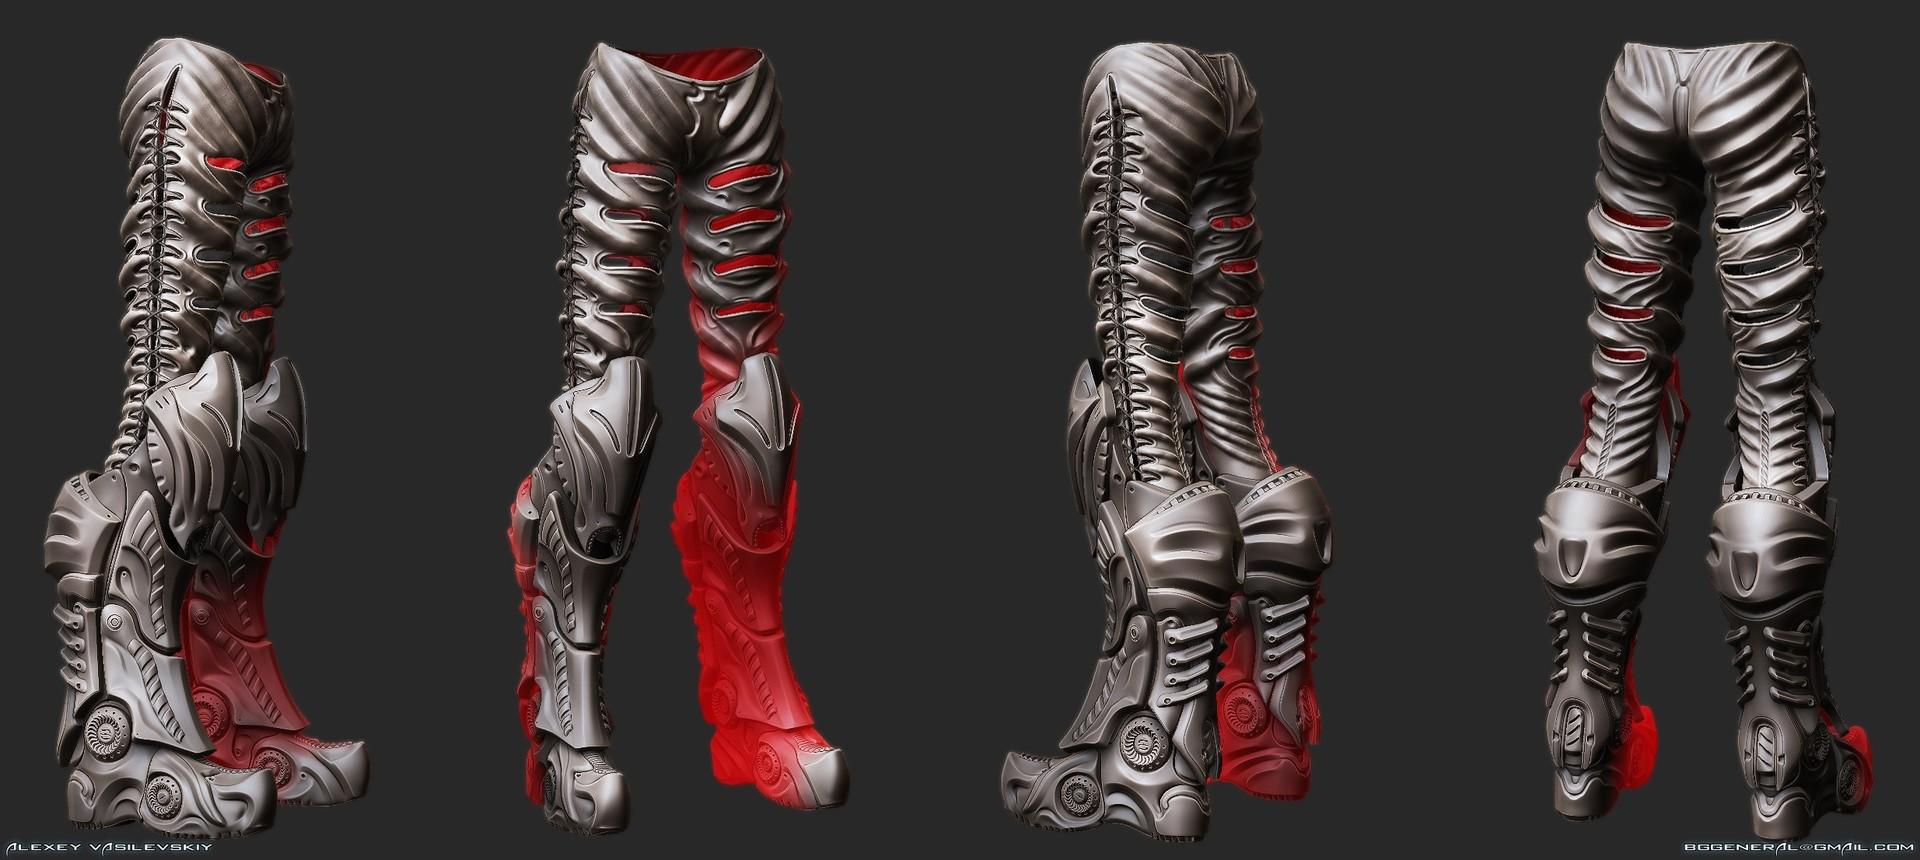 Alexey Vasilevskiy Fantasy Female Armor Pants And Boots